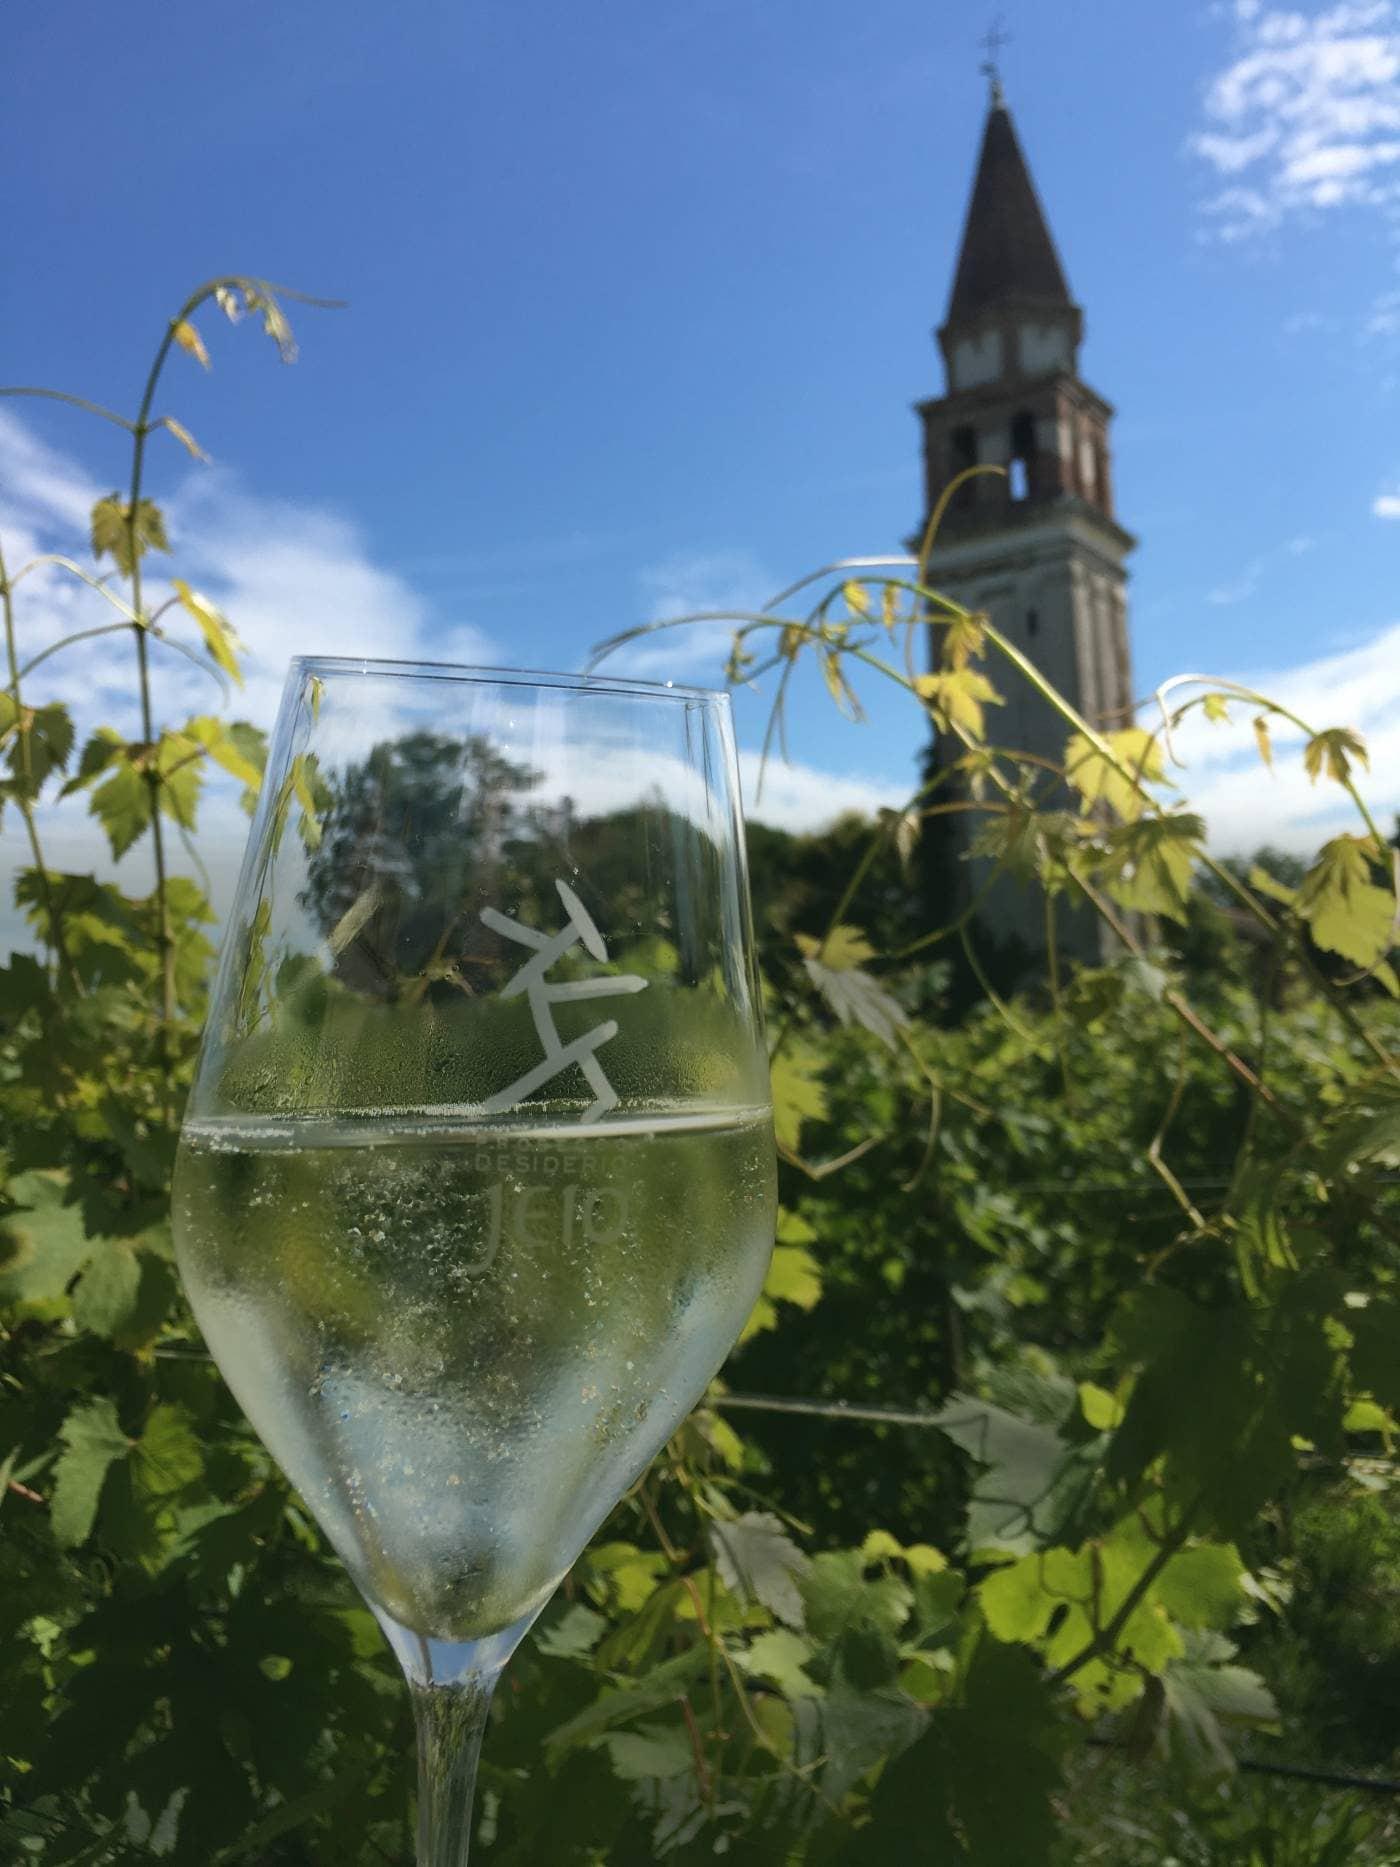 CinCin from the Venissa Wine Resort in Venice